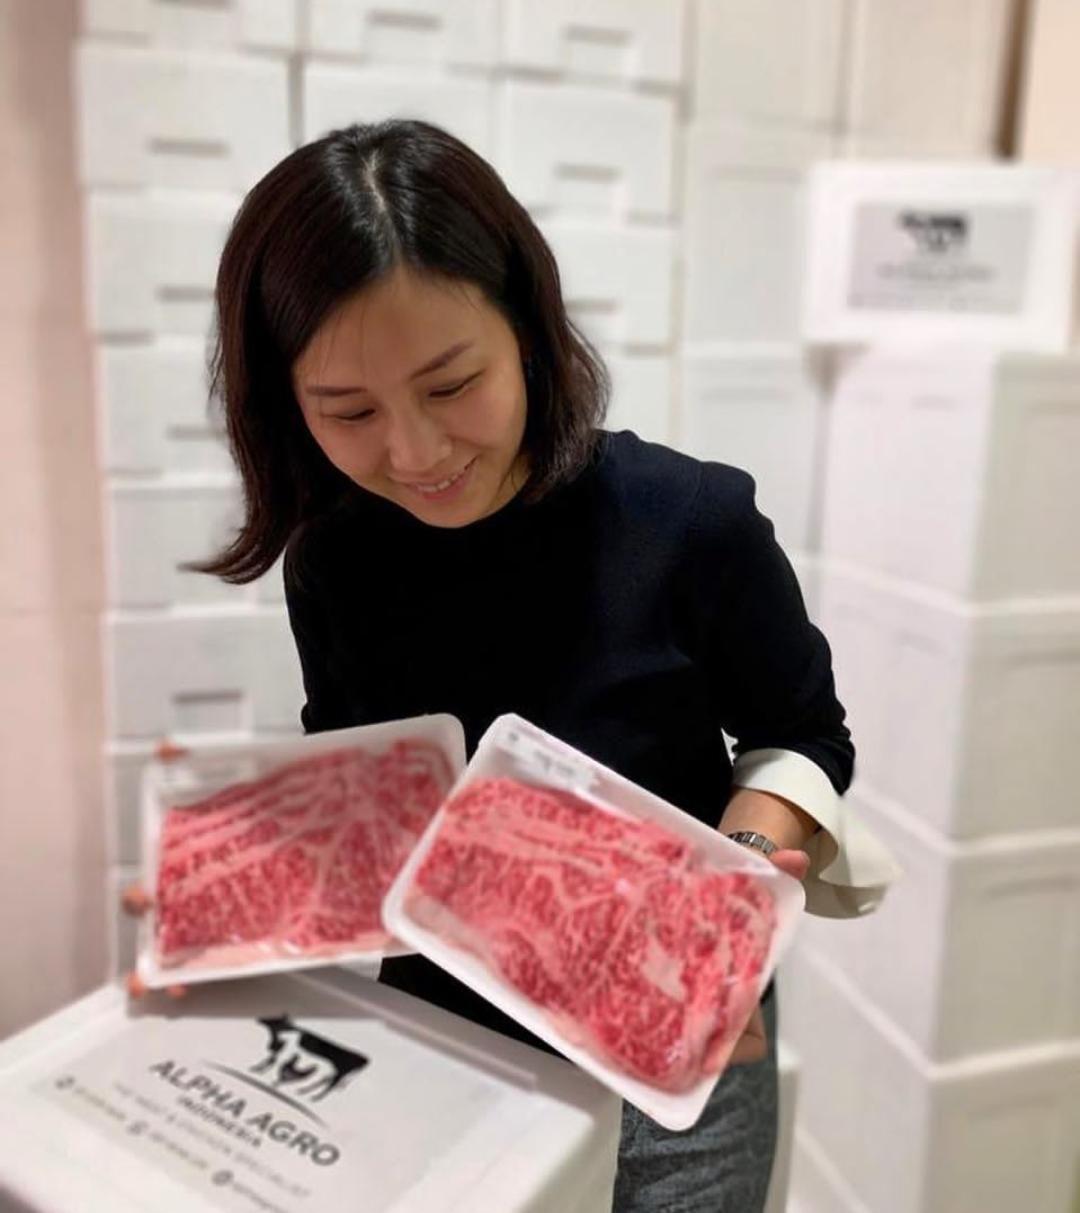 Berpose di Dapur, Veronica Tan Sibuk Urus Bisnis 'Wagyu Meat Specialist'